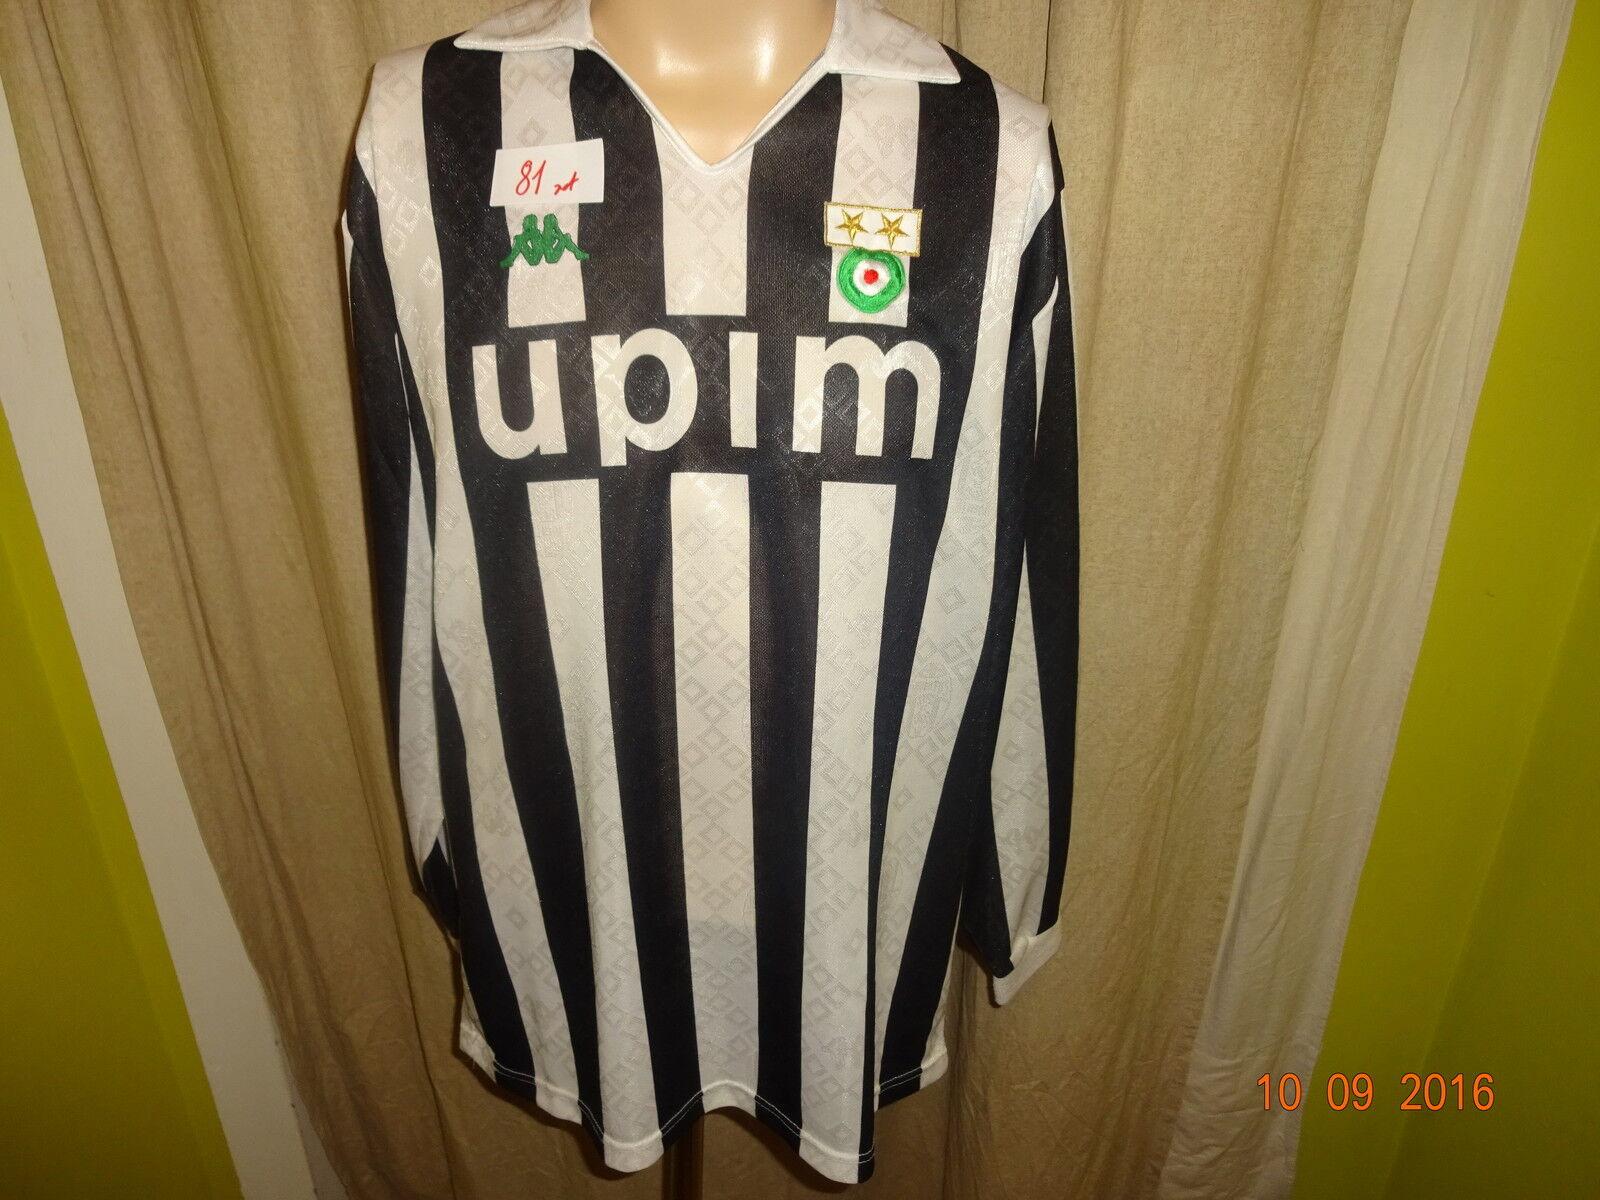 Juventus Turin Original Kappa Langarm Heim Trikot 1989 90  upim  + Nr.5 Gr.XL